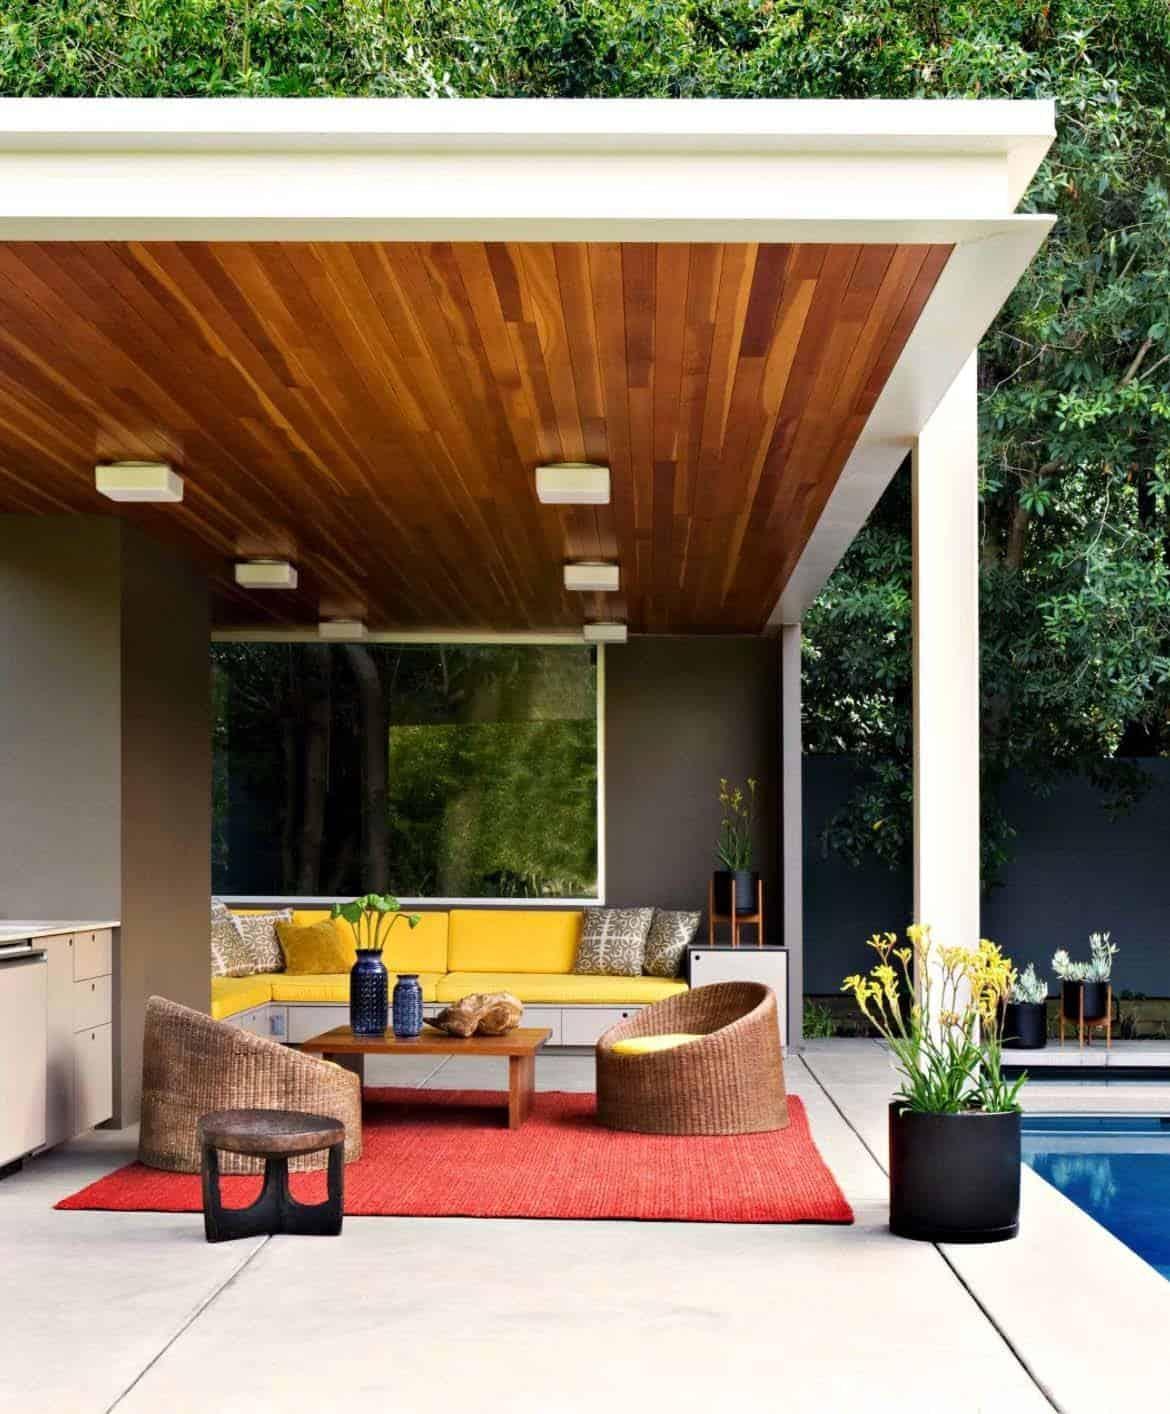 Maison Moderne Mid-Century-Jamie Bush-24-1 Kindesign